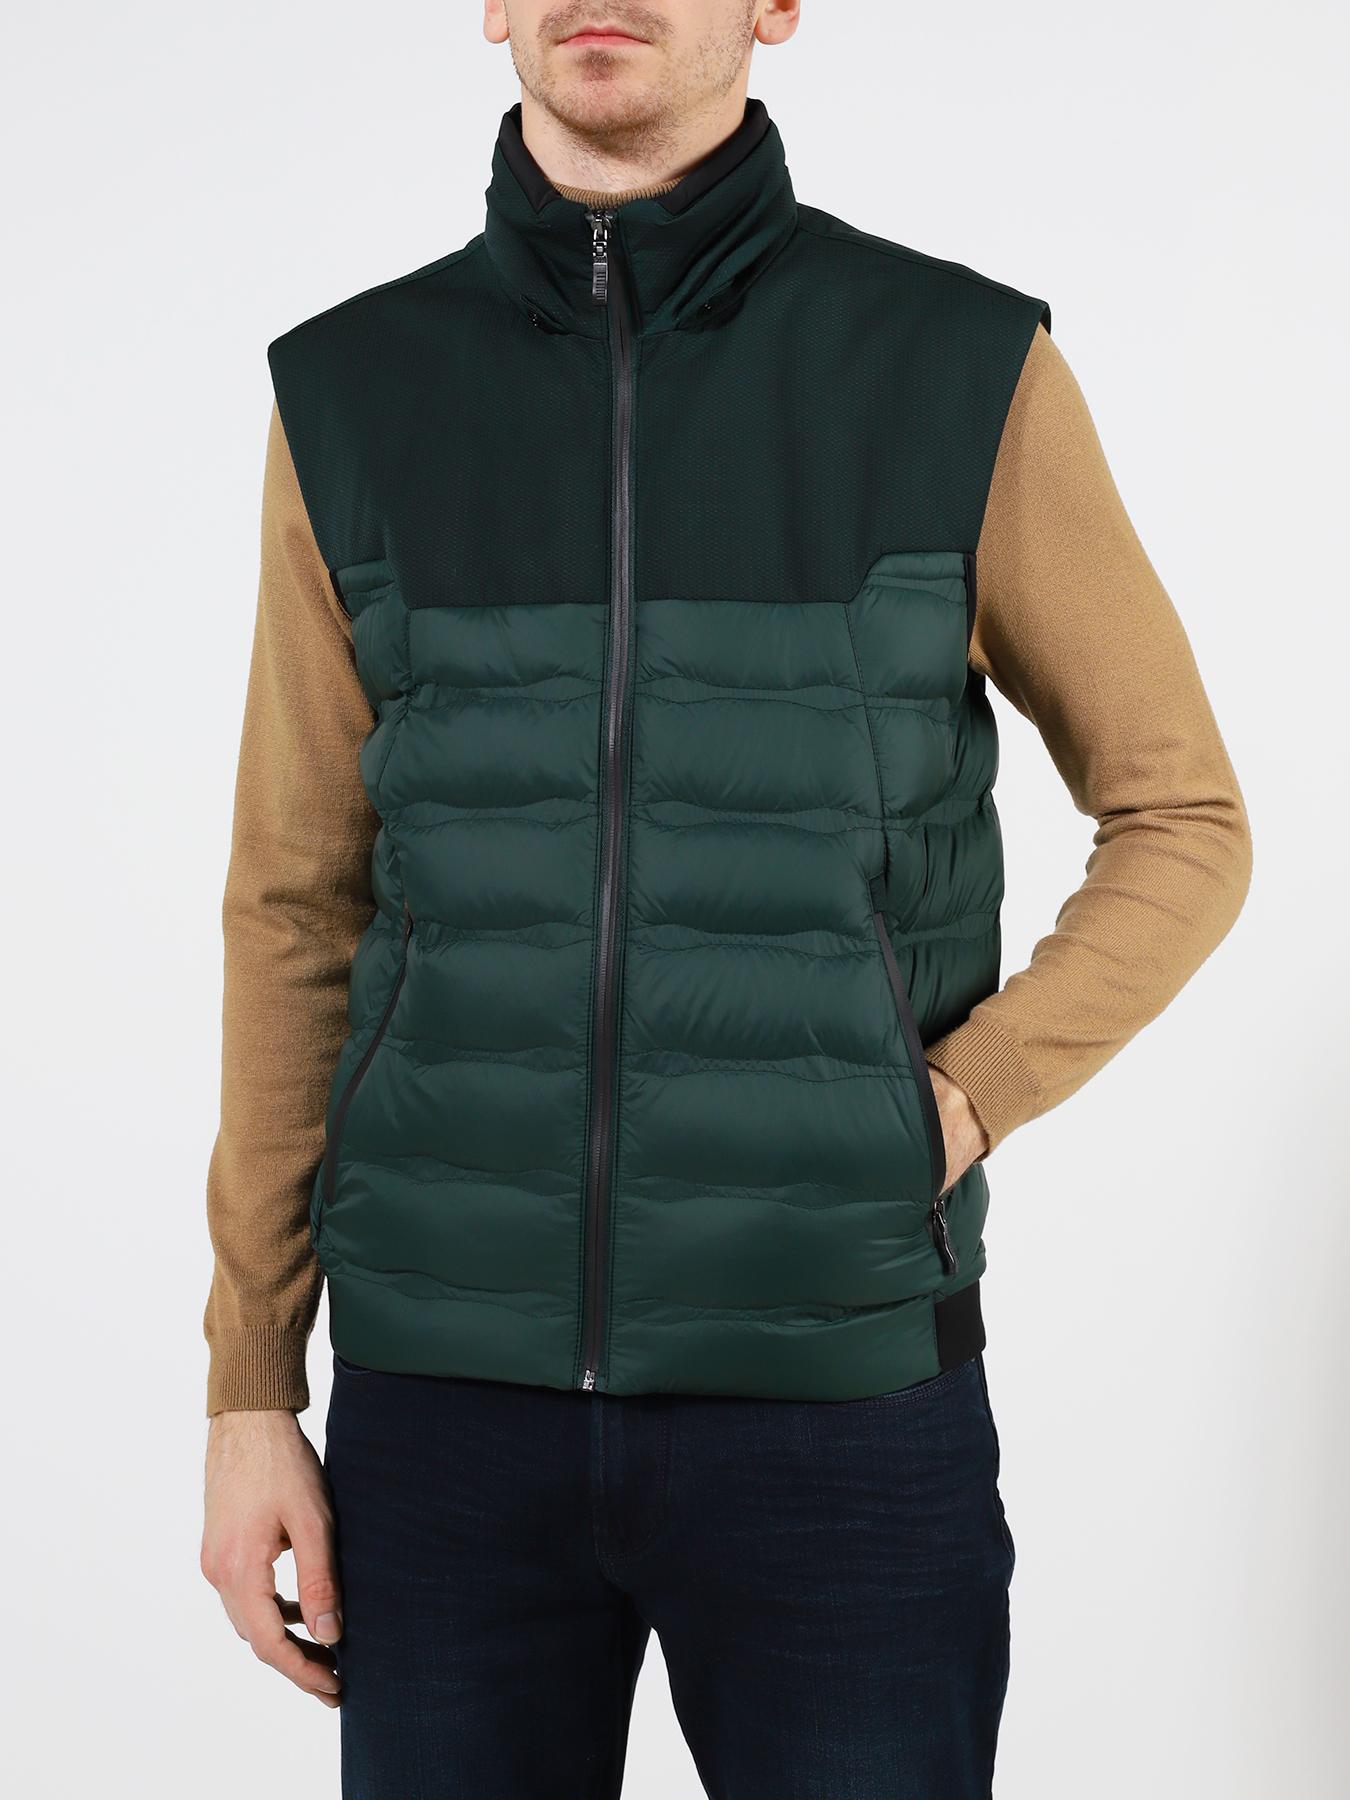 Куртка BOSS Мужская куртка 2 в 1 J Skyn